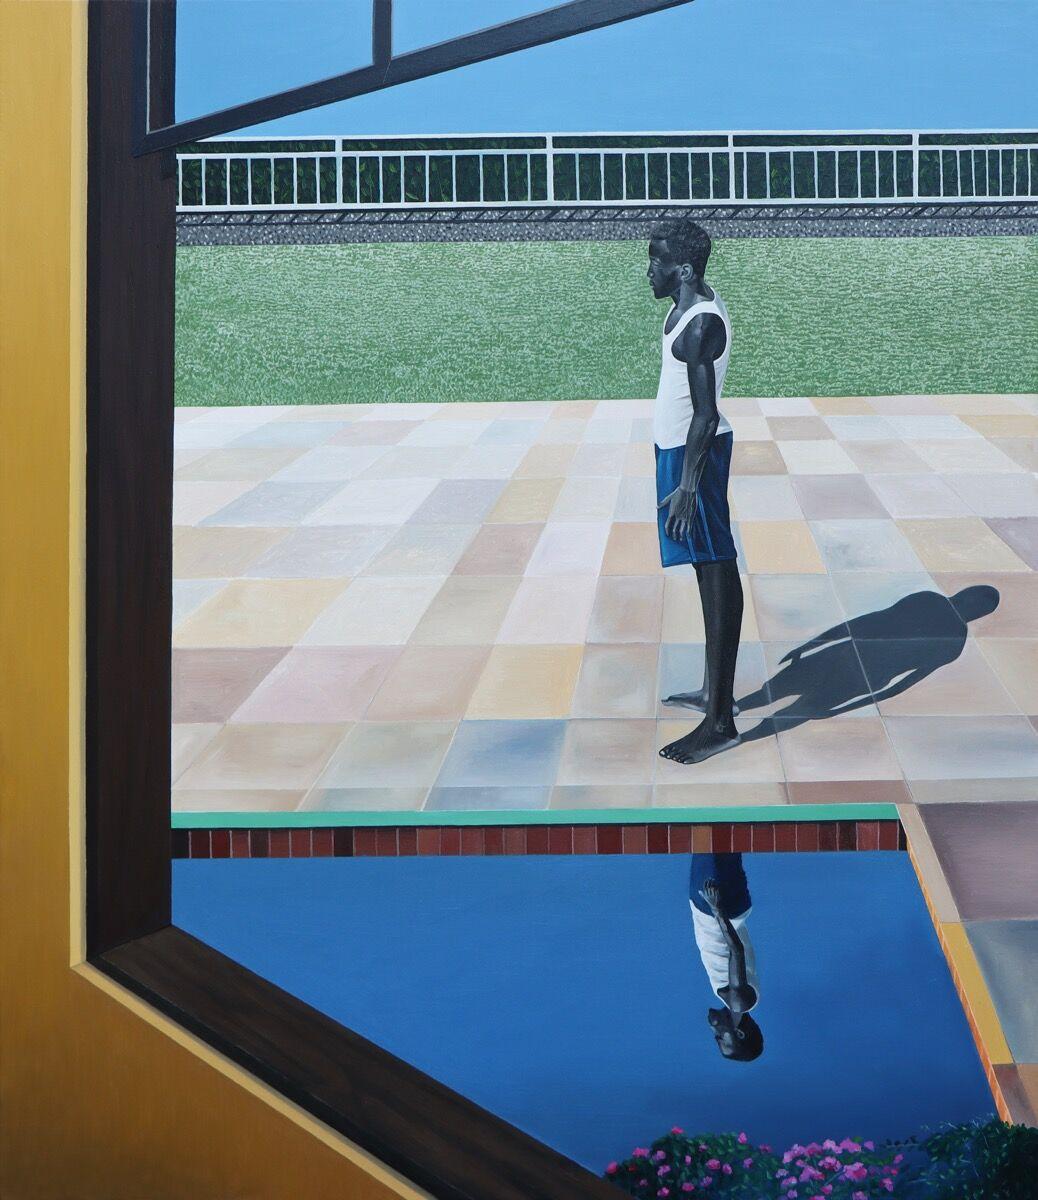 Ian Mwesiga, Man Standing by the Pool, 2020. Courtesy of Mariane Ibrahim.